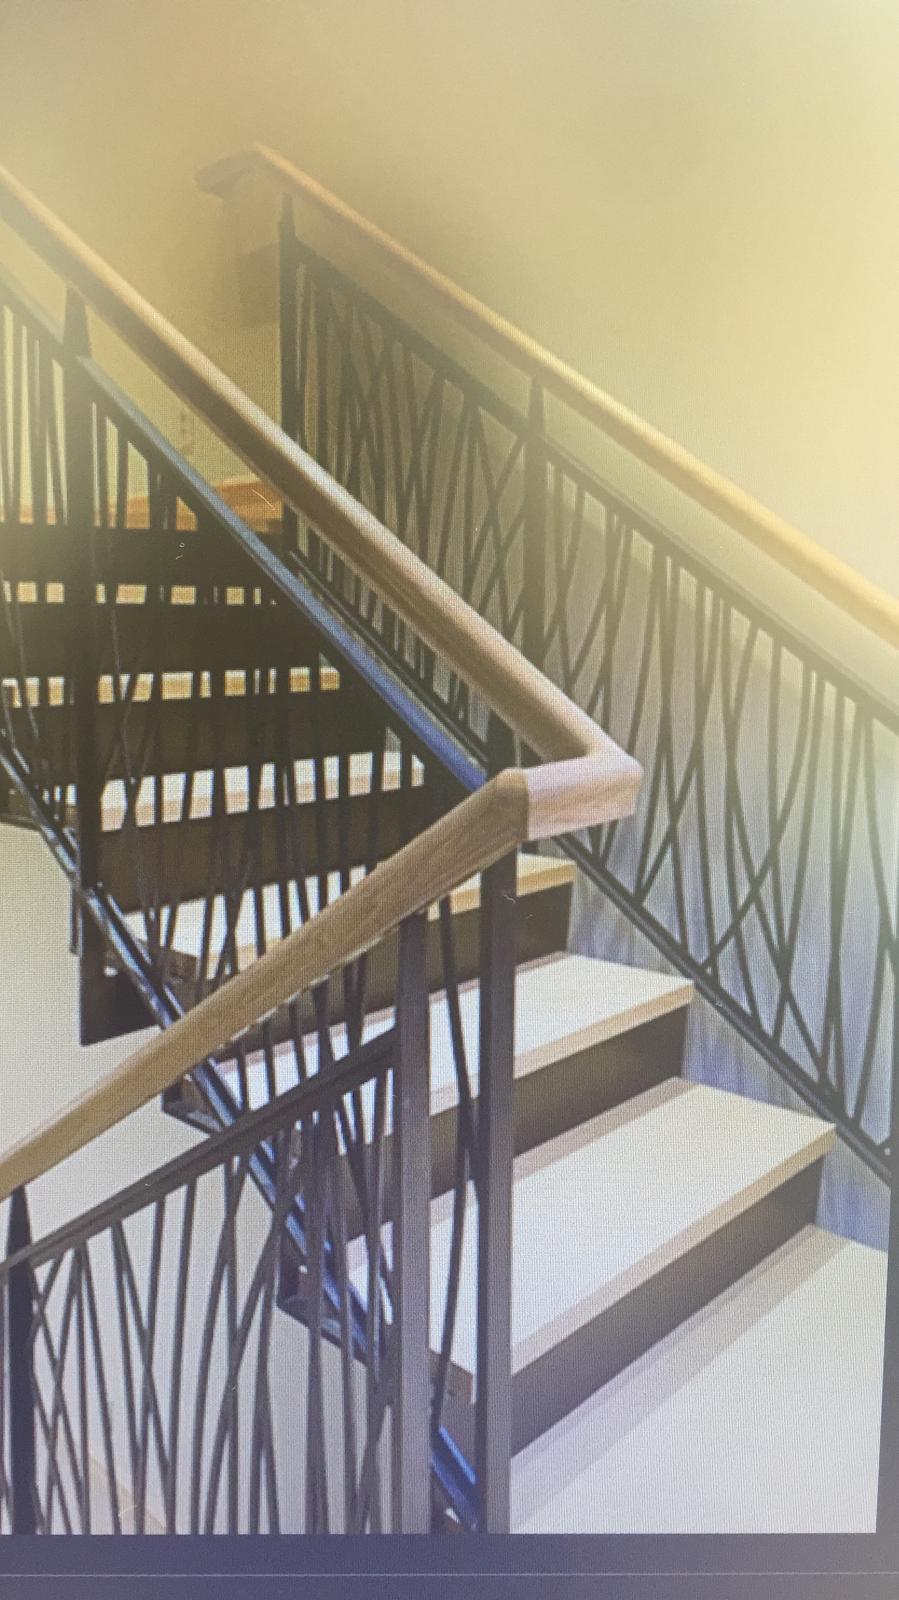 Lazer kesim ahşap küpeşteli merdiven korkuluk